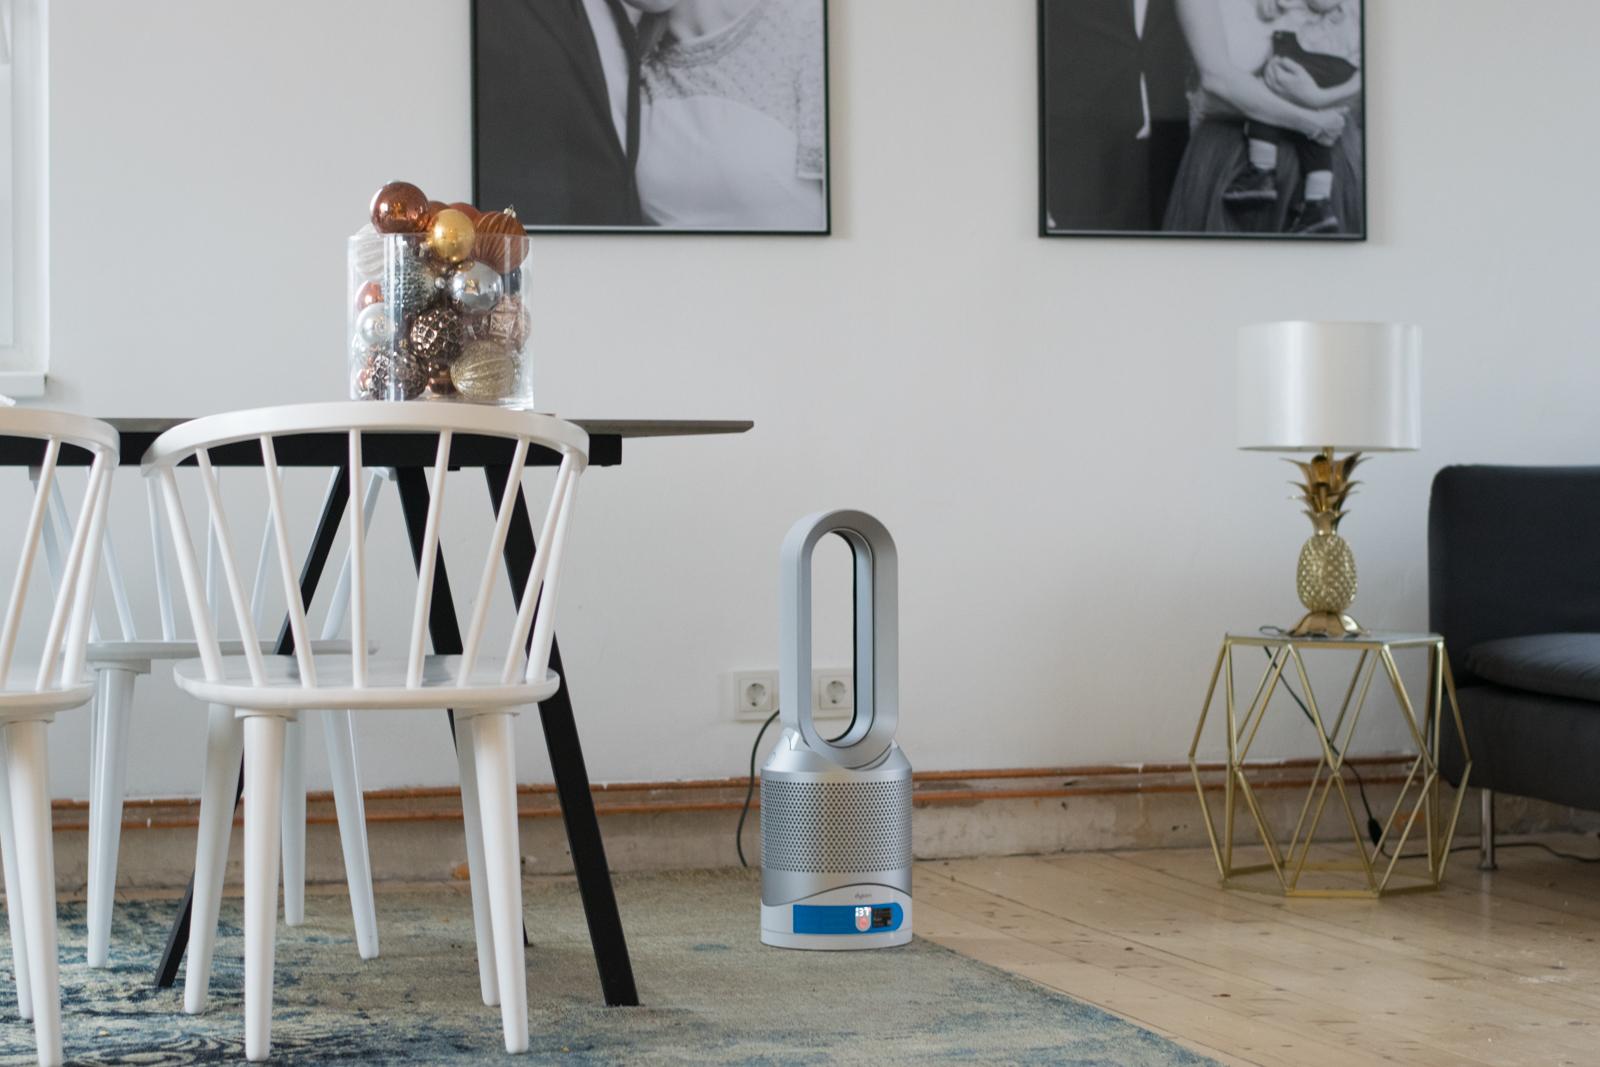 dyson pure hot cool link im test heizl fter und ventilator mit smartphone steuerung. Black Bedroom Furniture Sets. Home Design Ideas